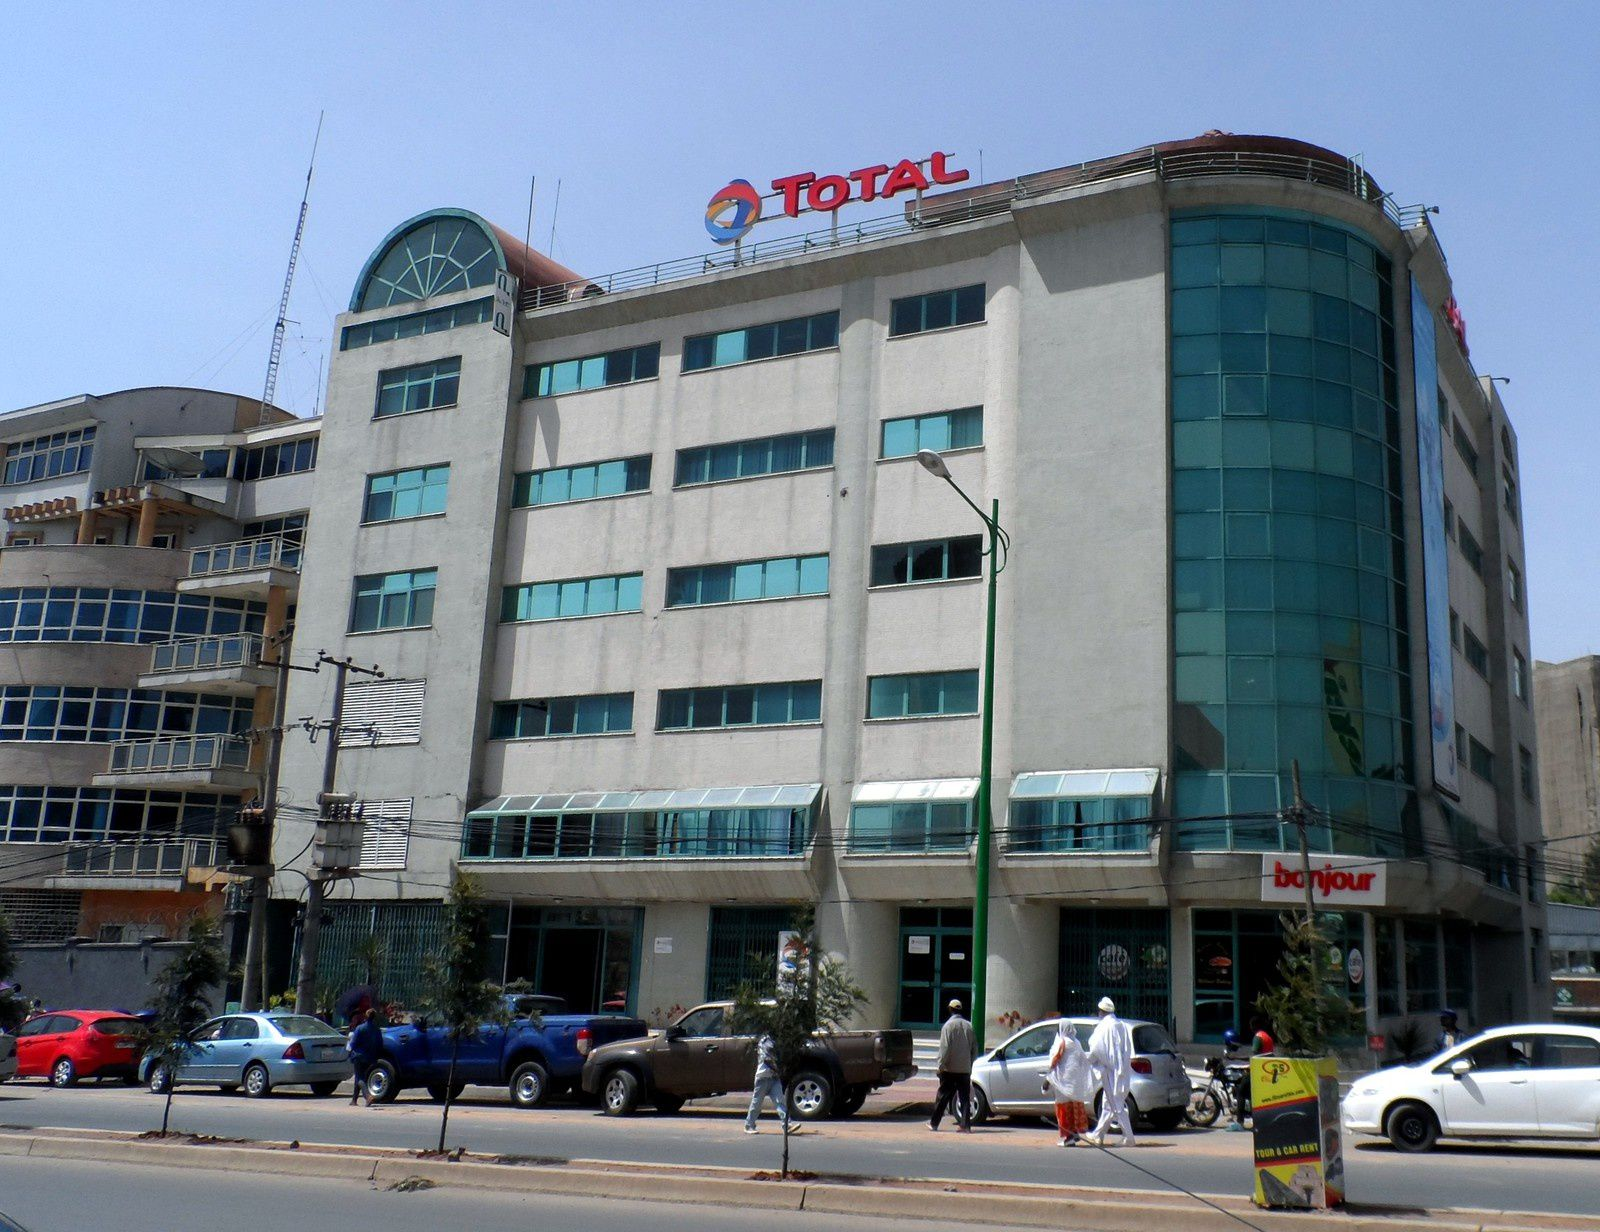 Addis Abeba, les premiers pas